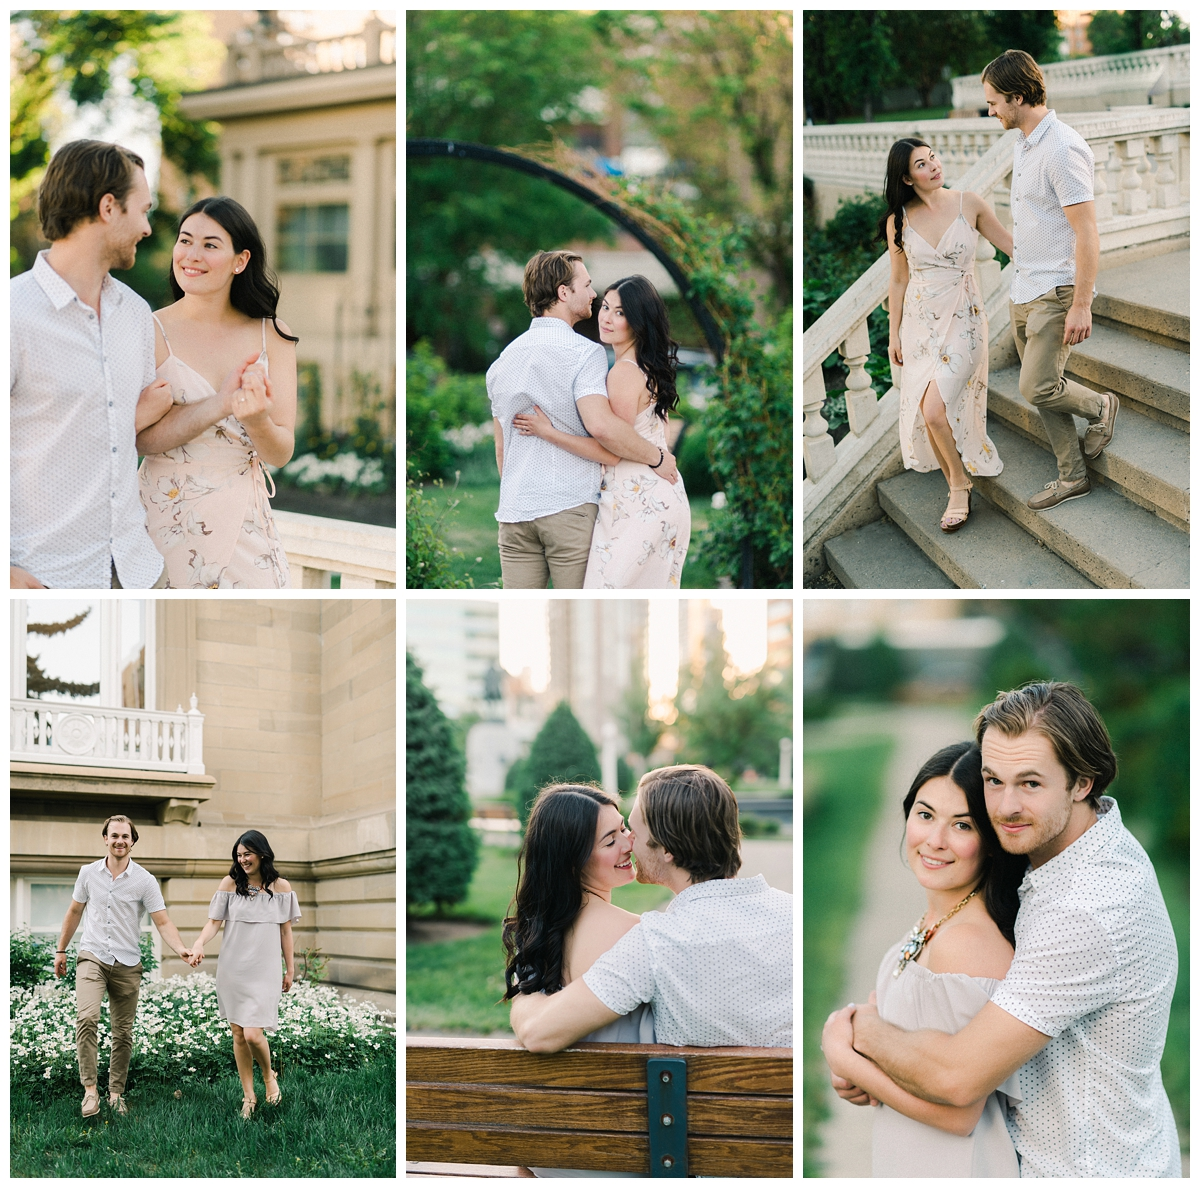 yycengagementphotographer (2 of 11).jpg